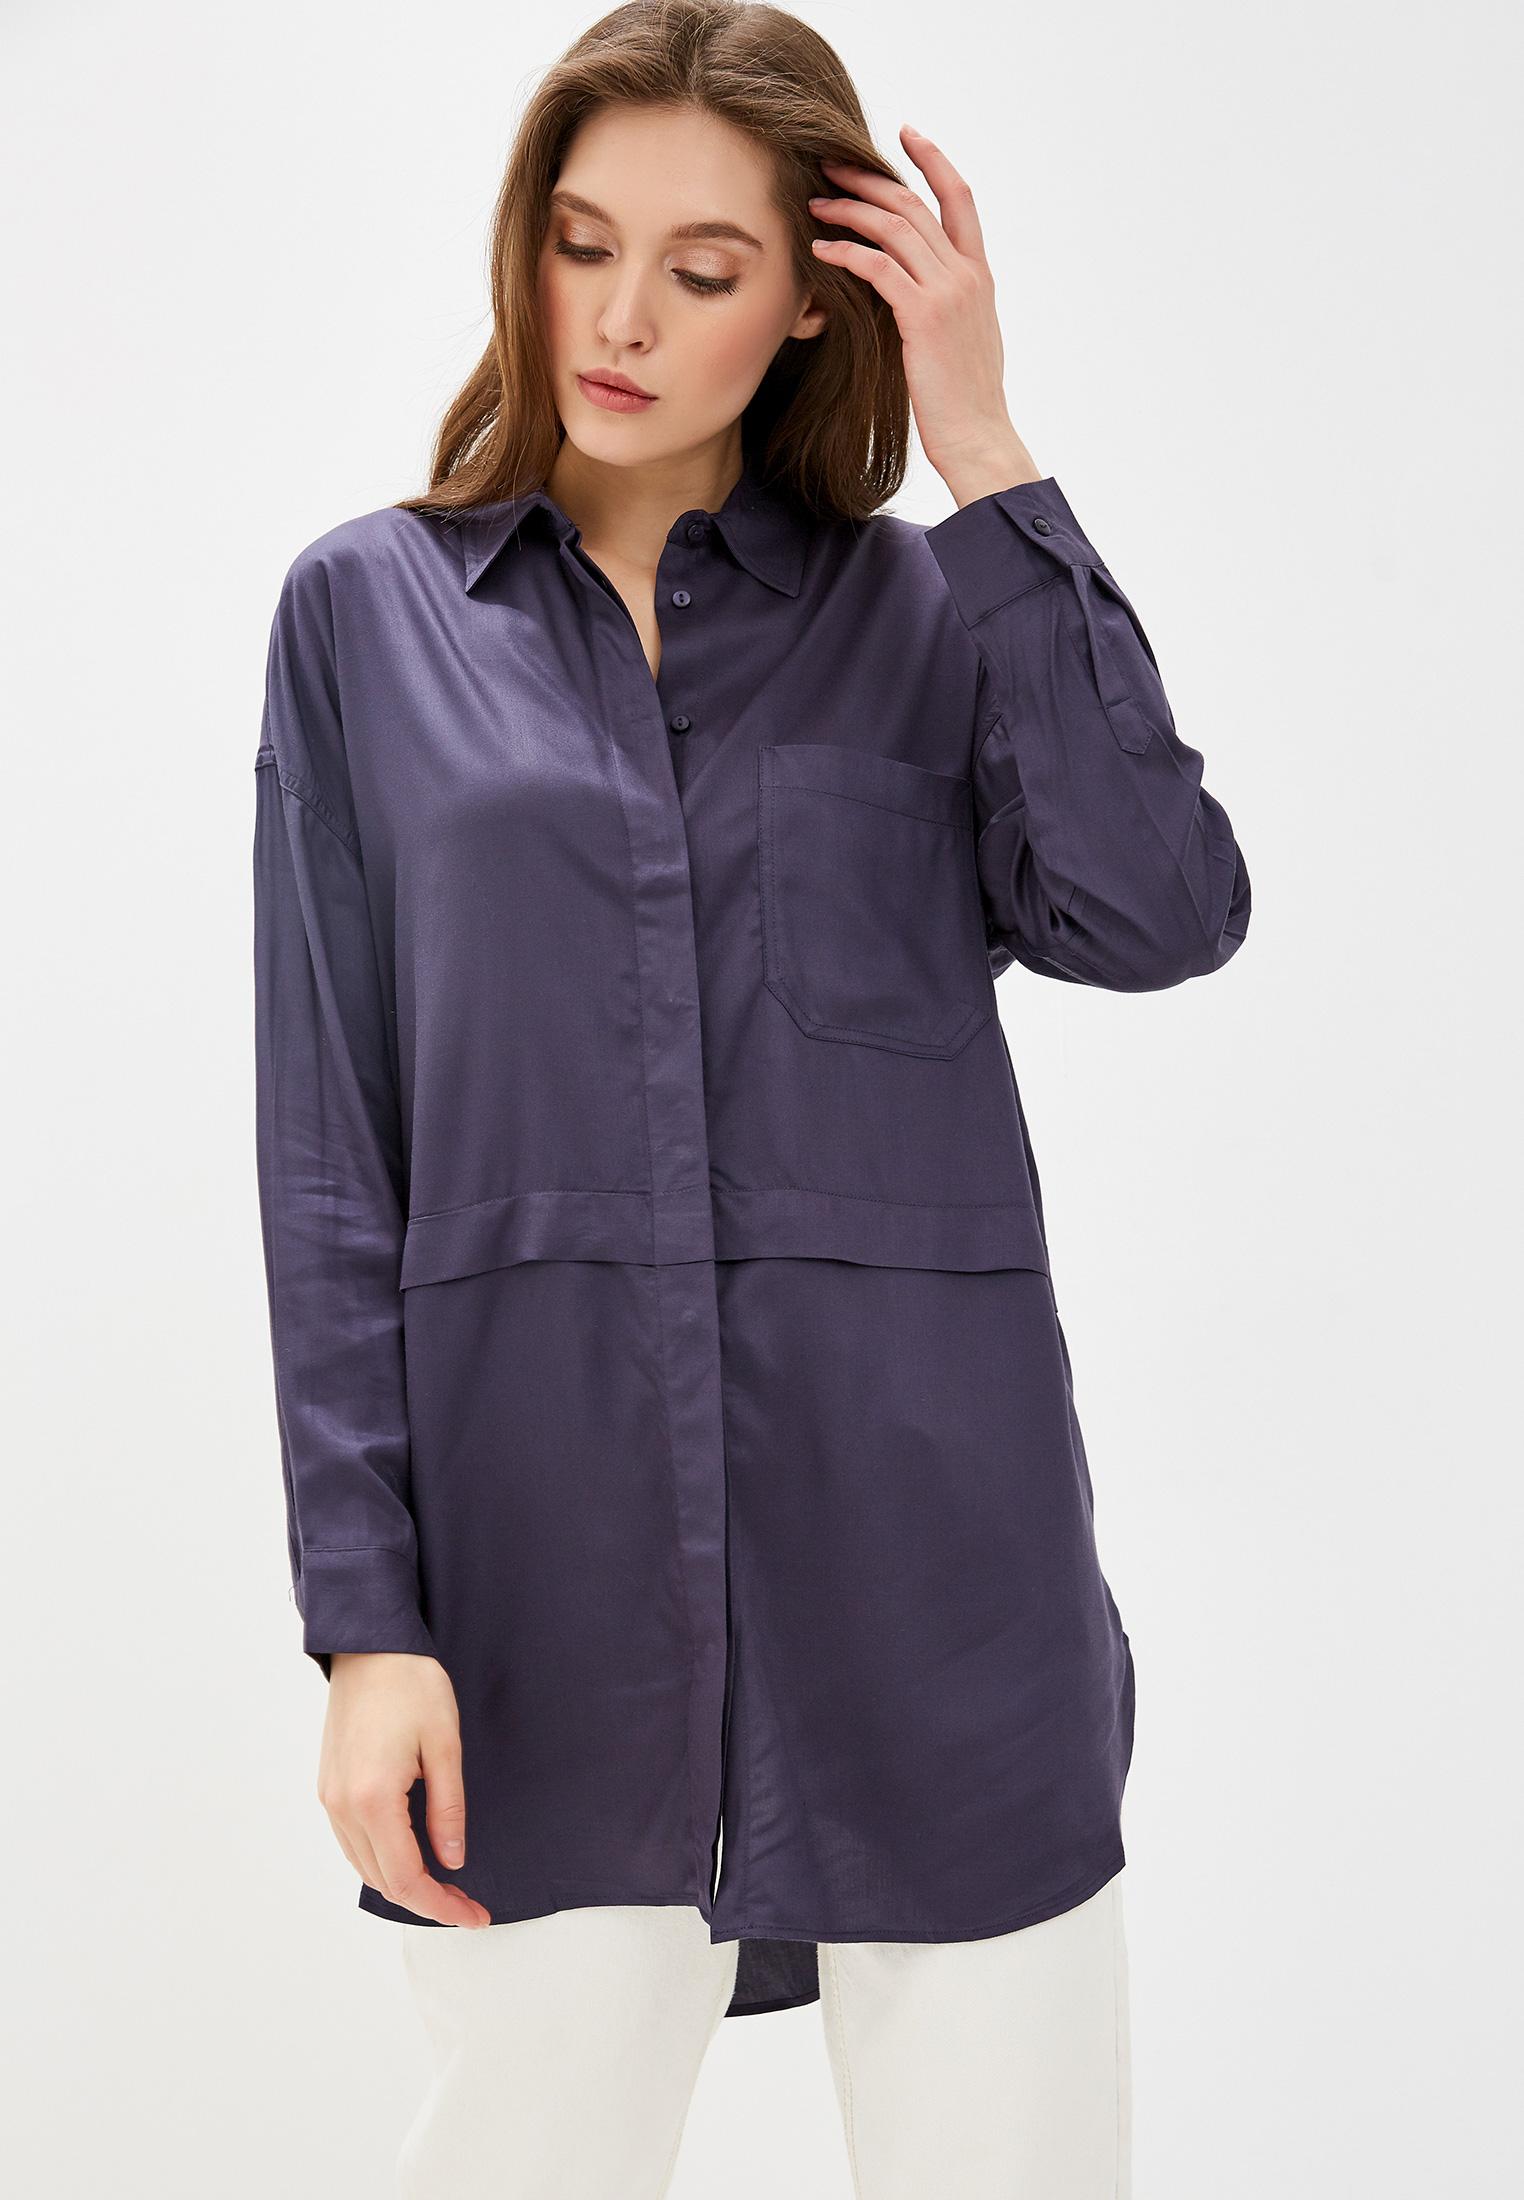 Блуза Sela (Сэла) TKw-312/1265-9422